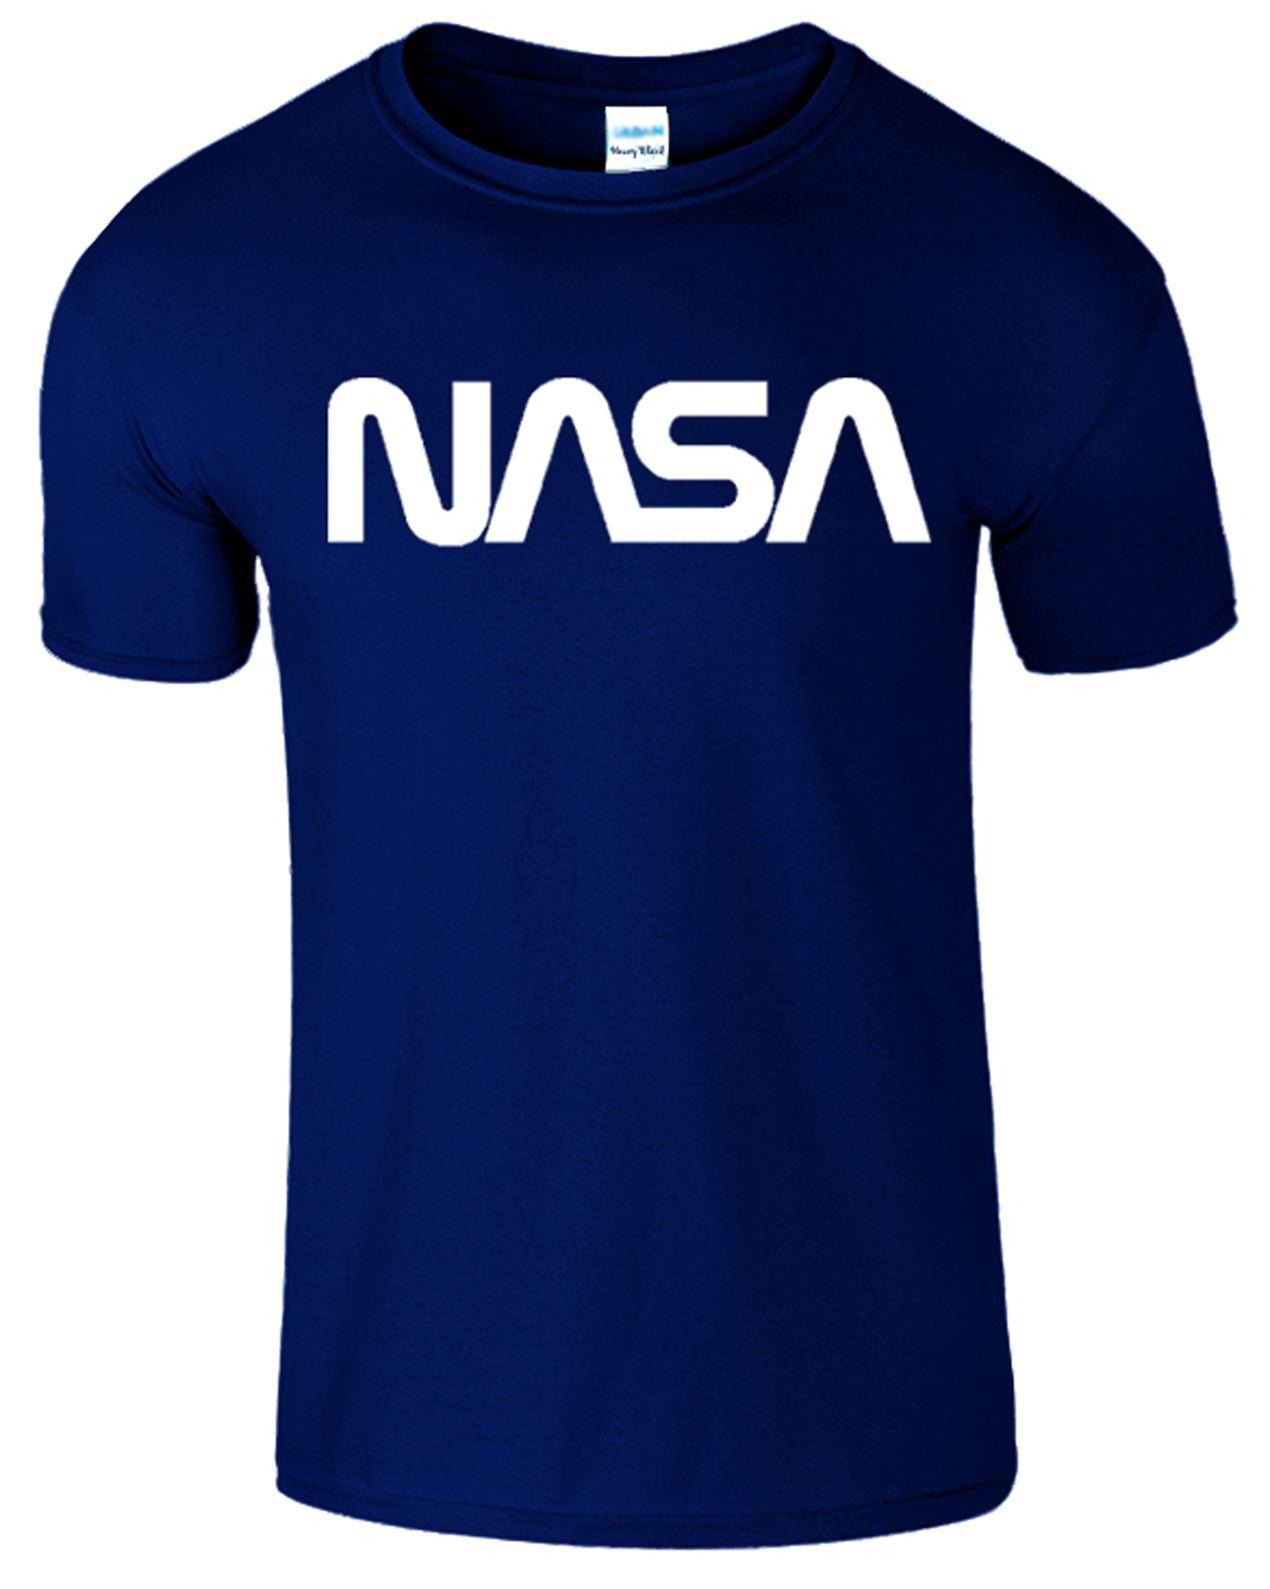 Nasa T Shirt New Awesome Design Mens Space Retro Astronaut ...